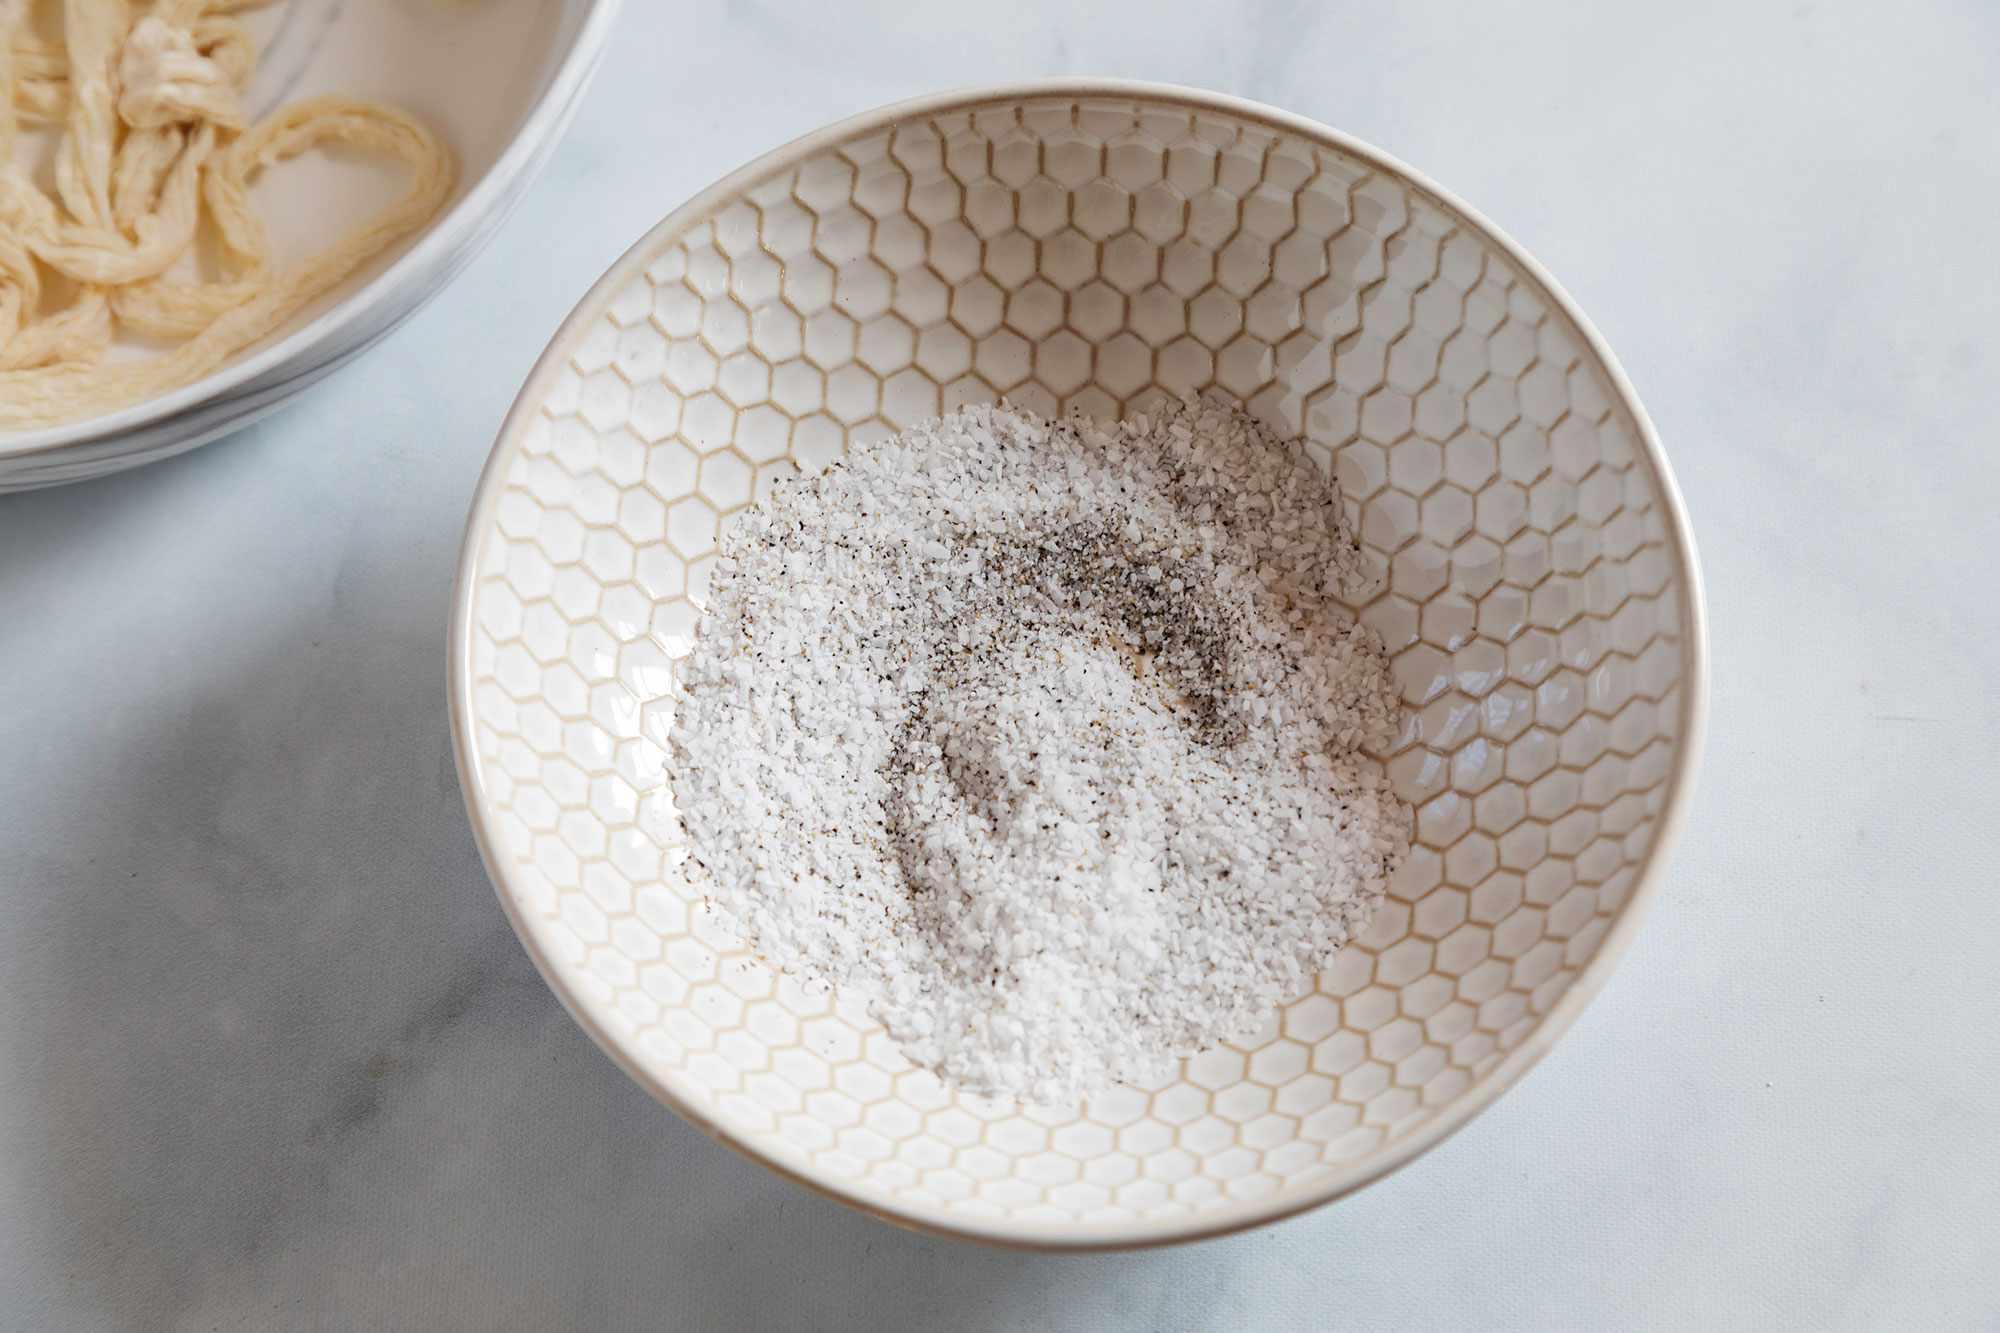 salt and fresh ground black pepper in a bowl